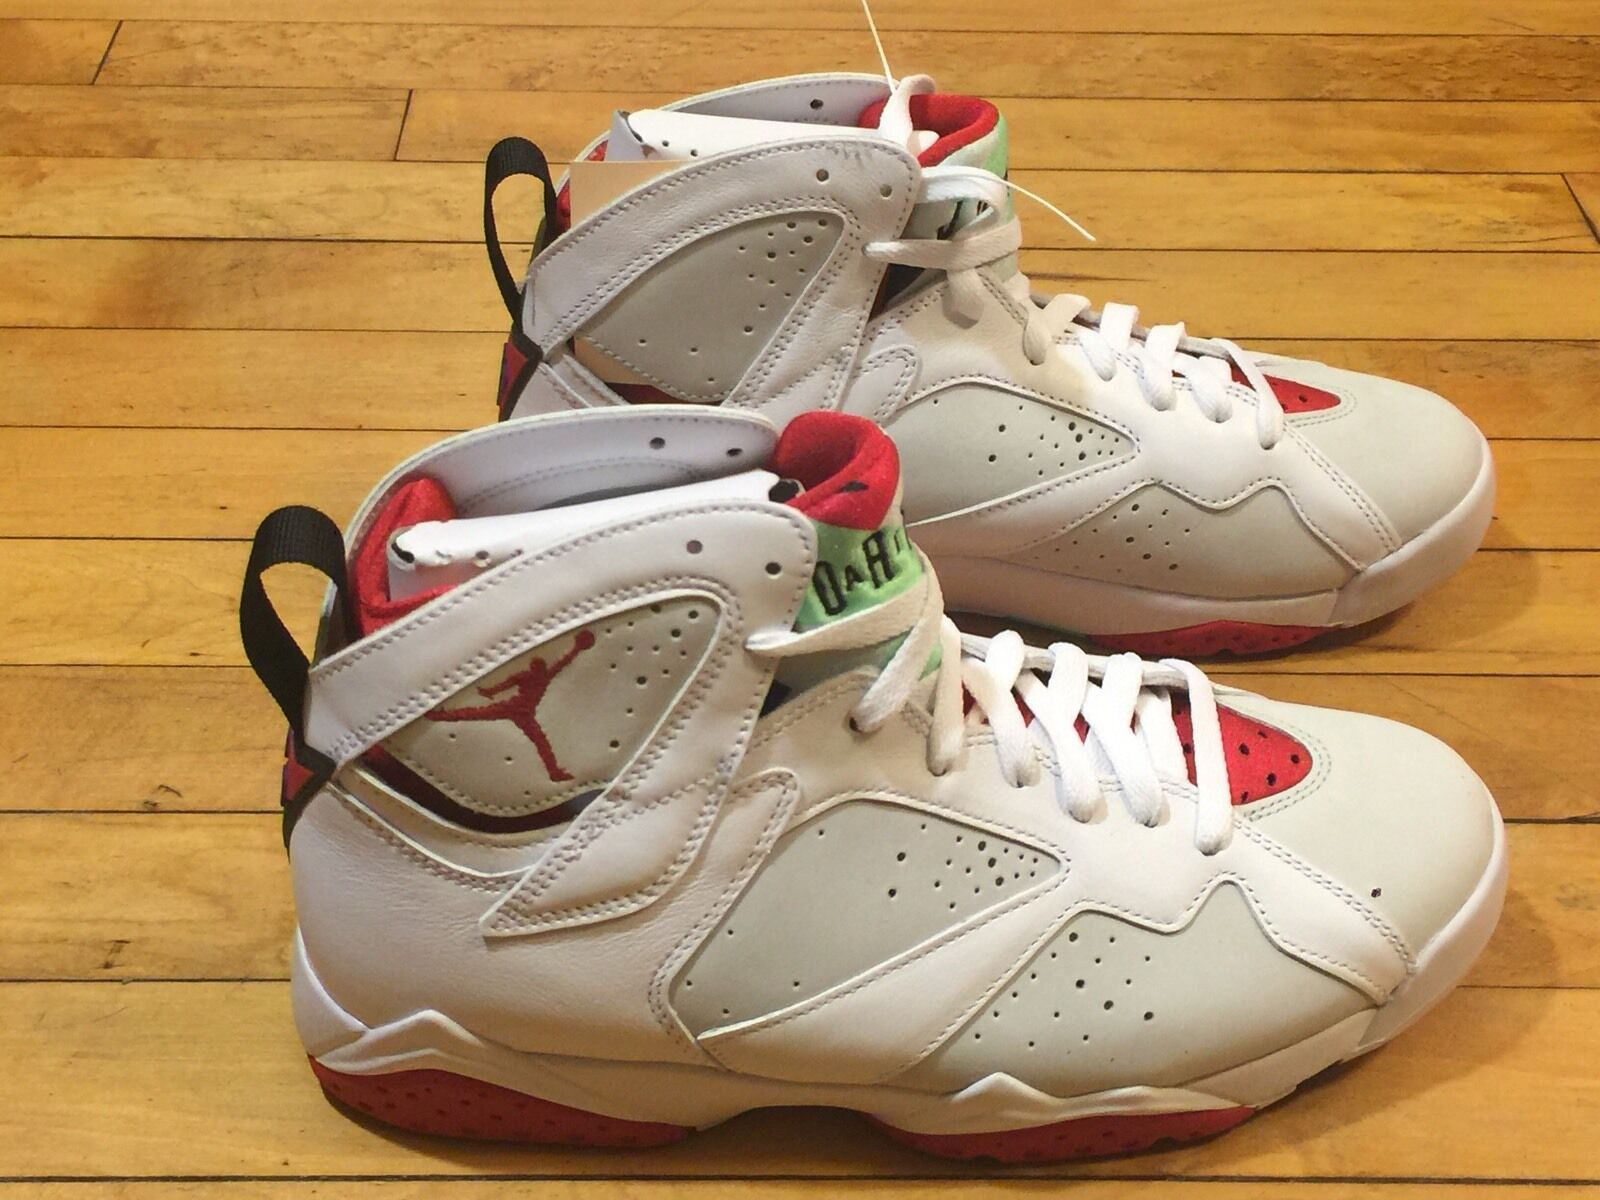 Nike air jordan 7 - retro - 7 304775-125 sz 8,5 hase bin olympischen bordeaux zigarre db - 637832